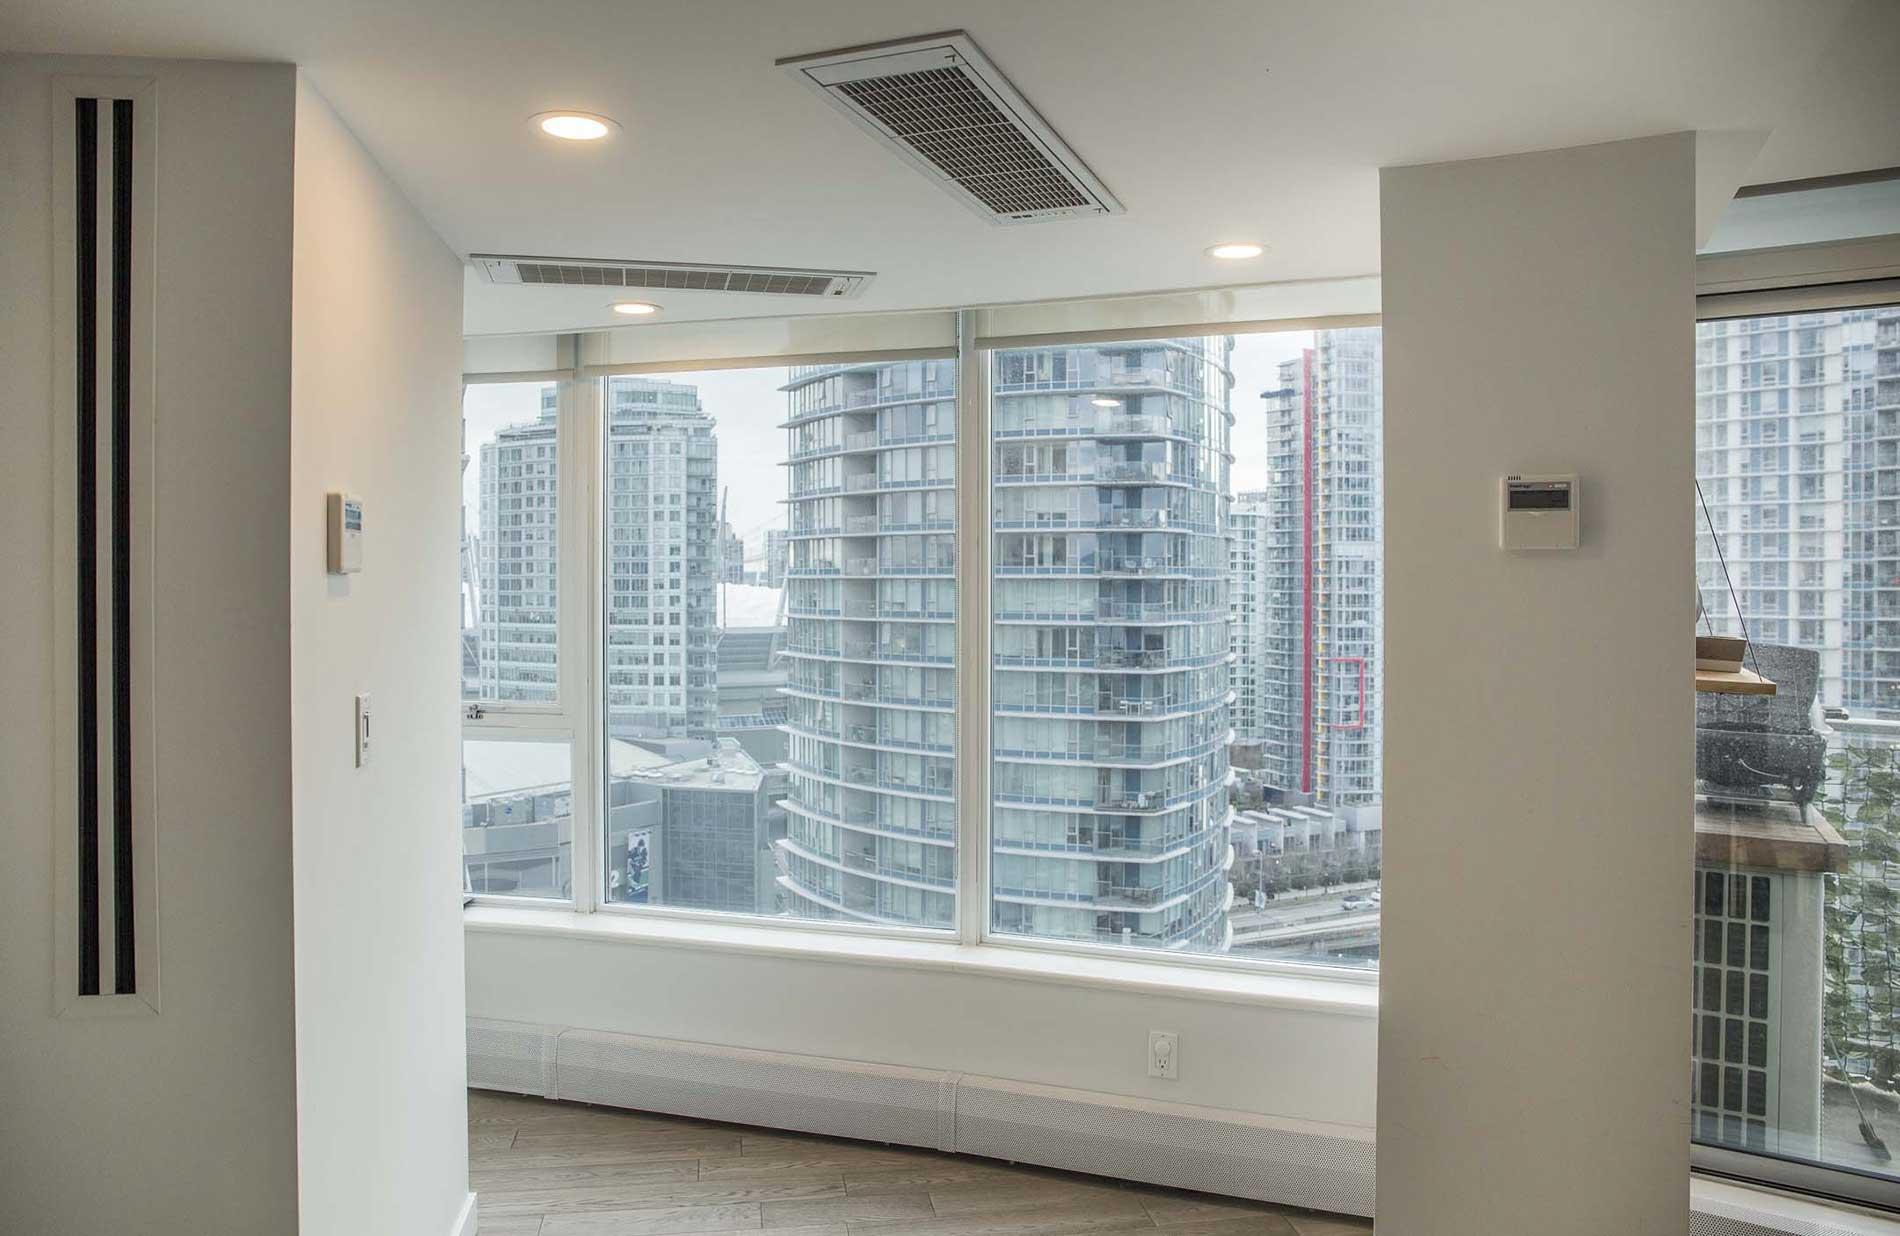 Ceiling mounted Evaporators